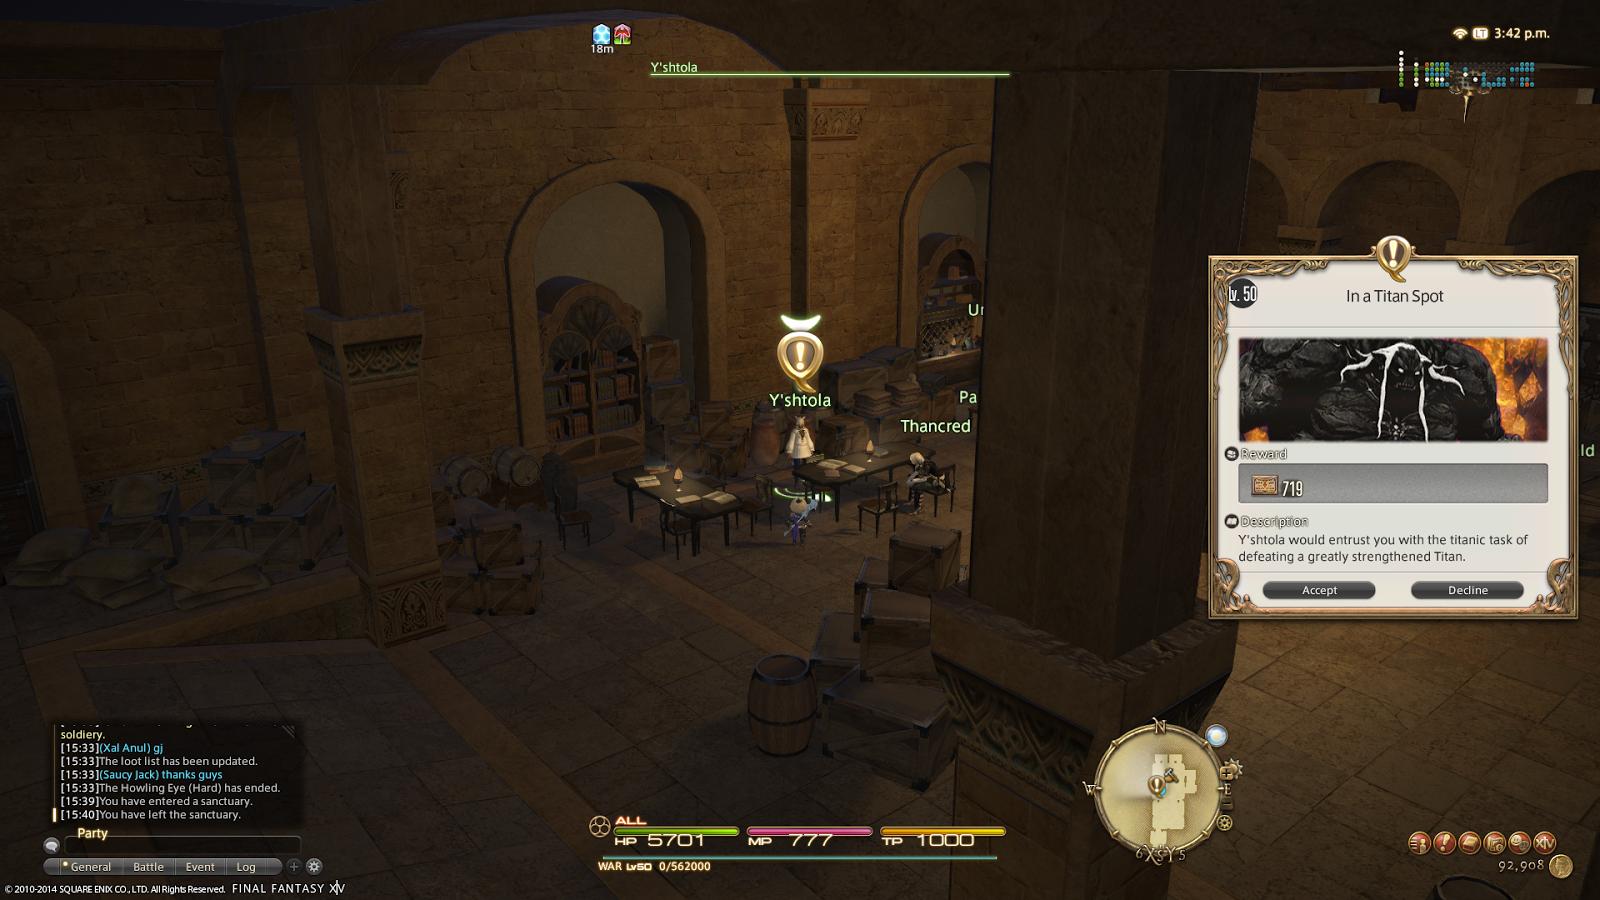 Final Fantasy XIV A Realm Reborn In A Titan Spot The Navel Hard Trial